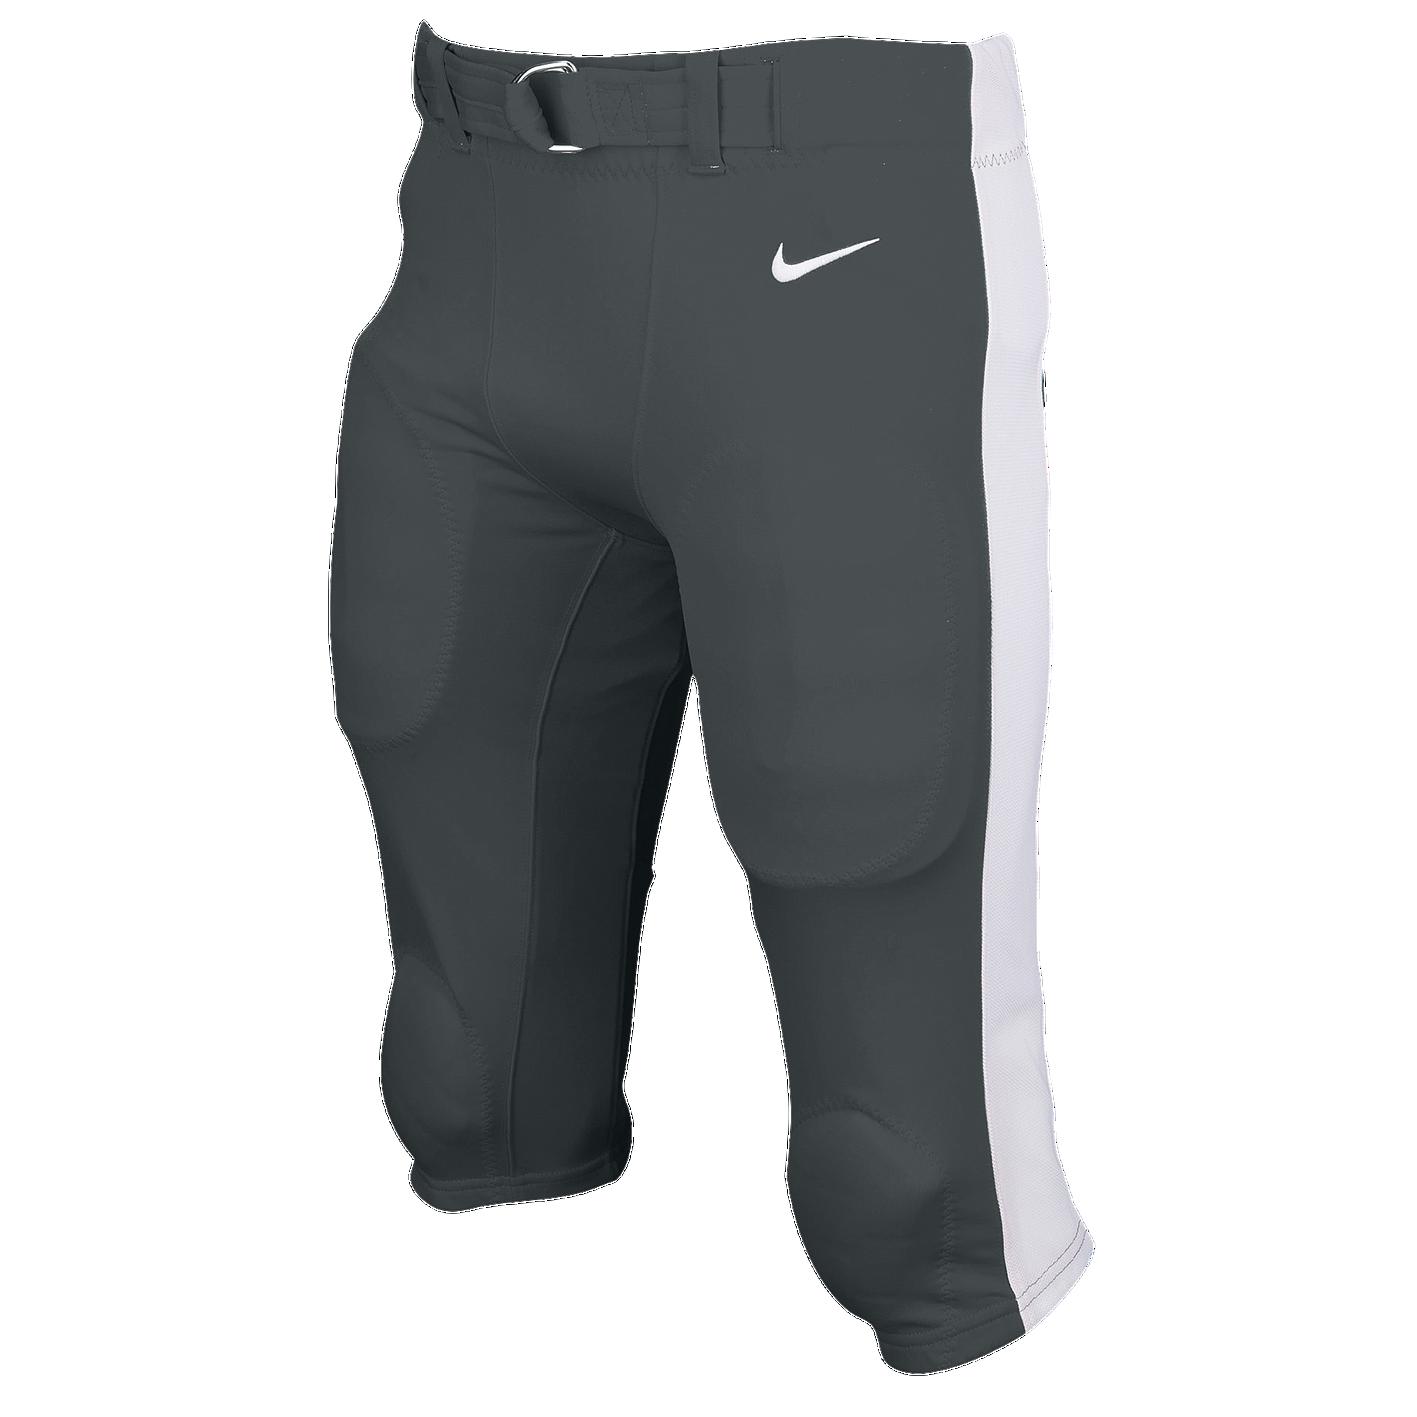 2982501fa454 Nike Team Stock Mach Speed Pants - Men s - Football - Clothing ...